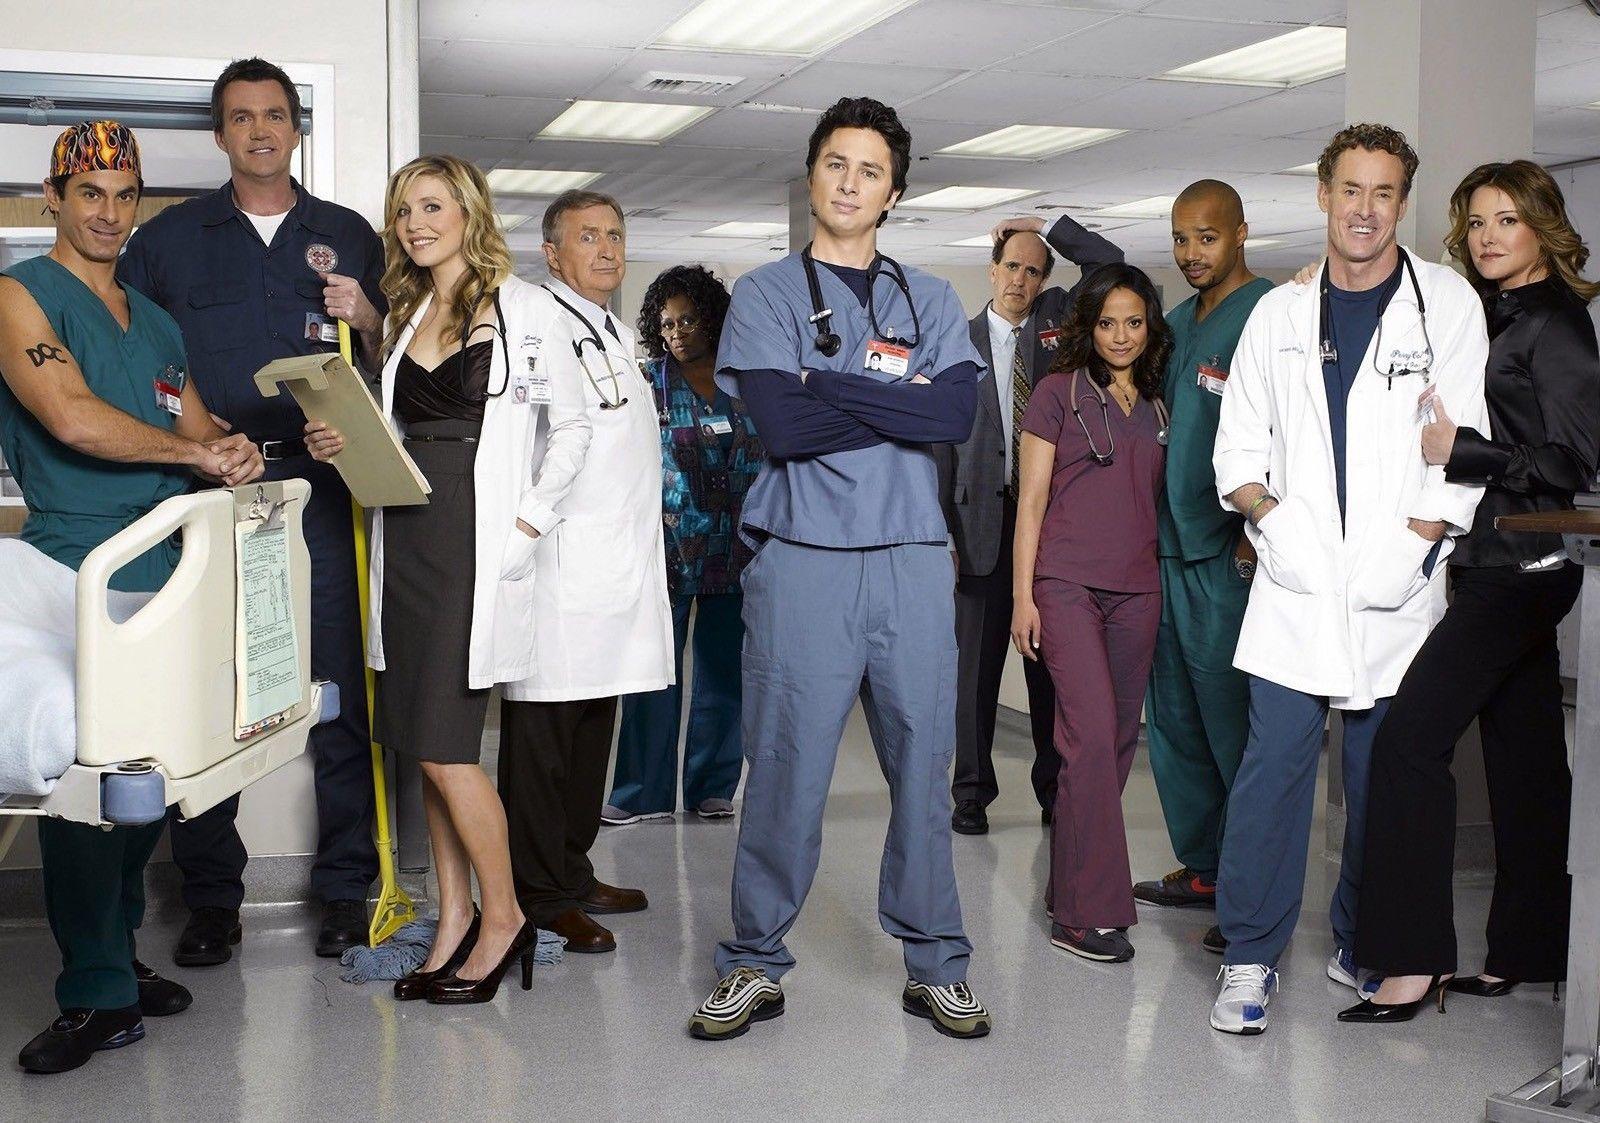 That interfere, scrubs tv show cast